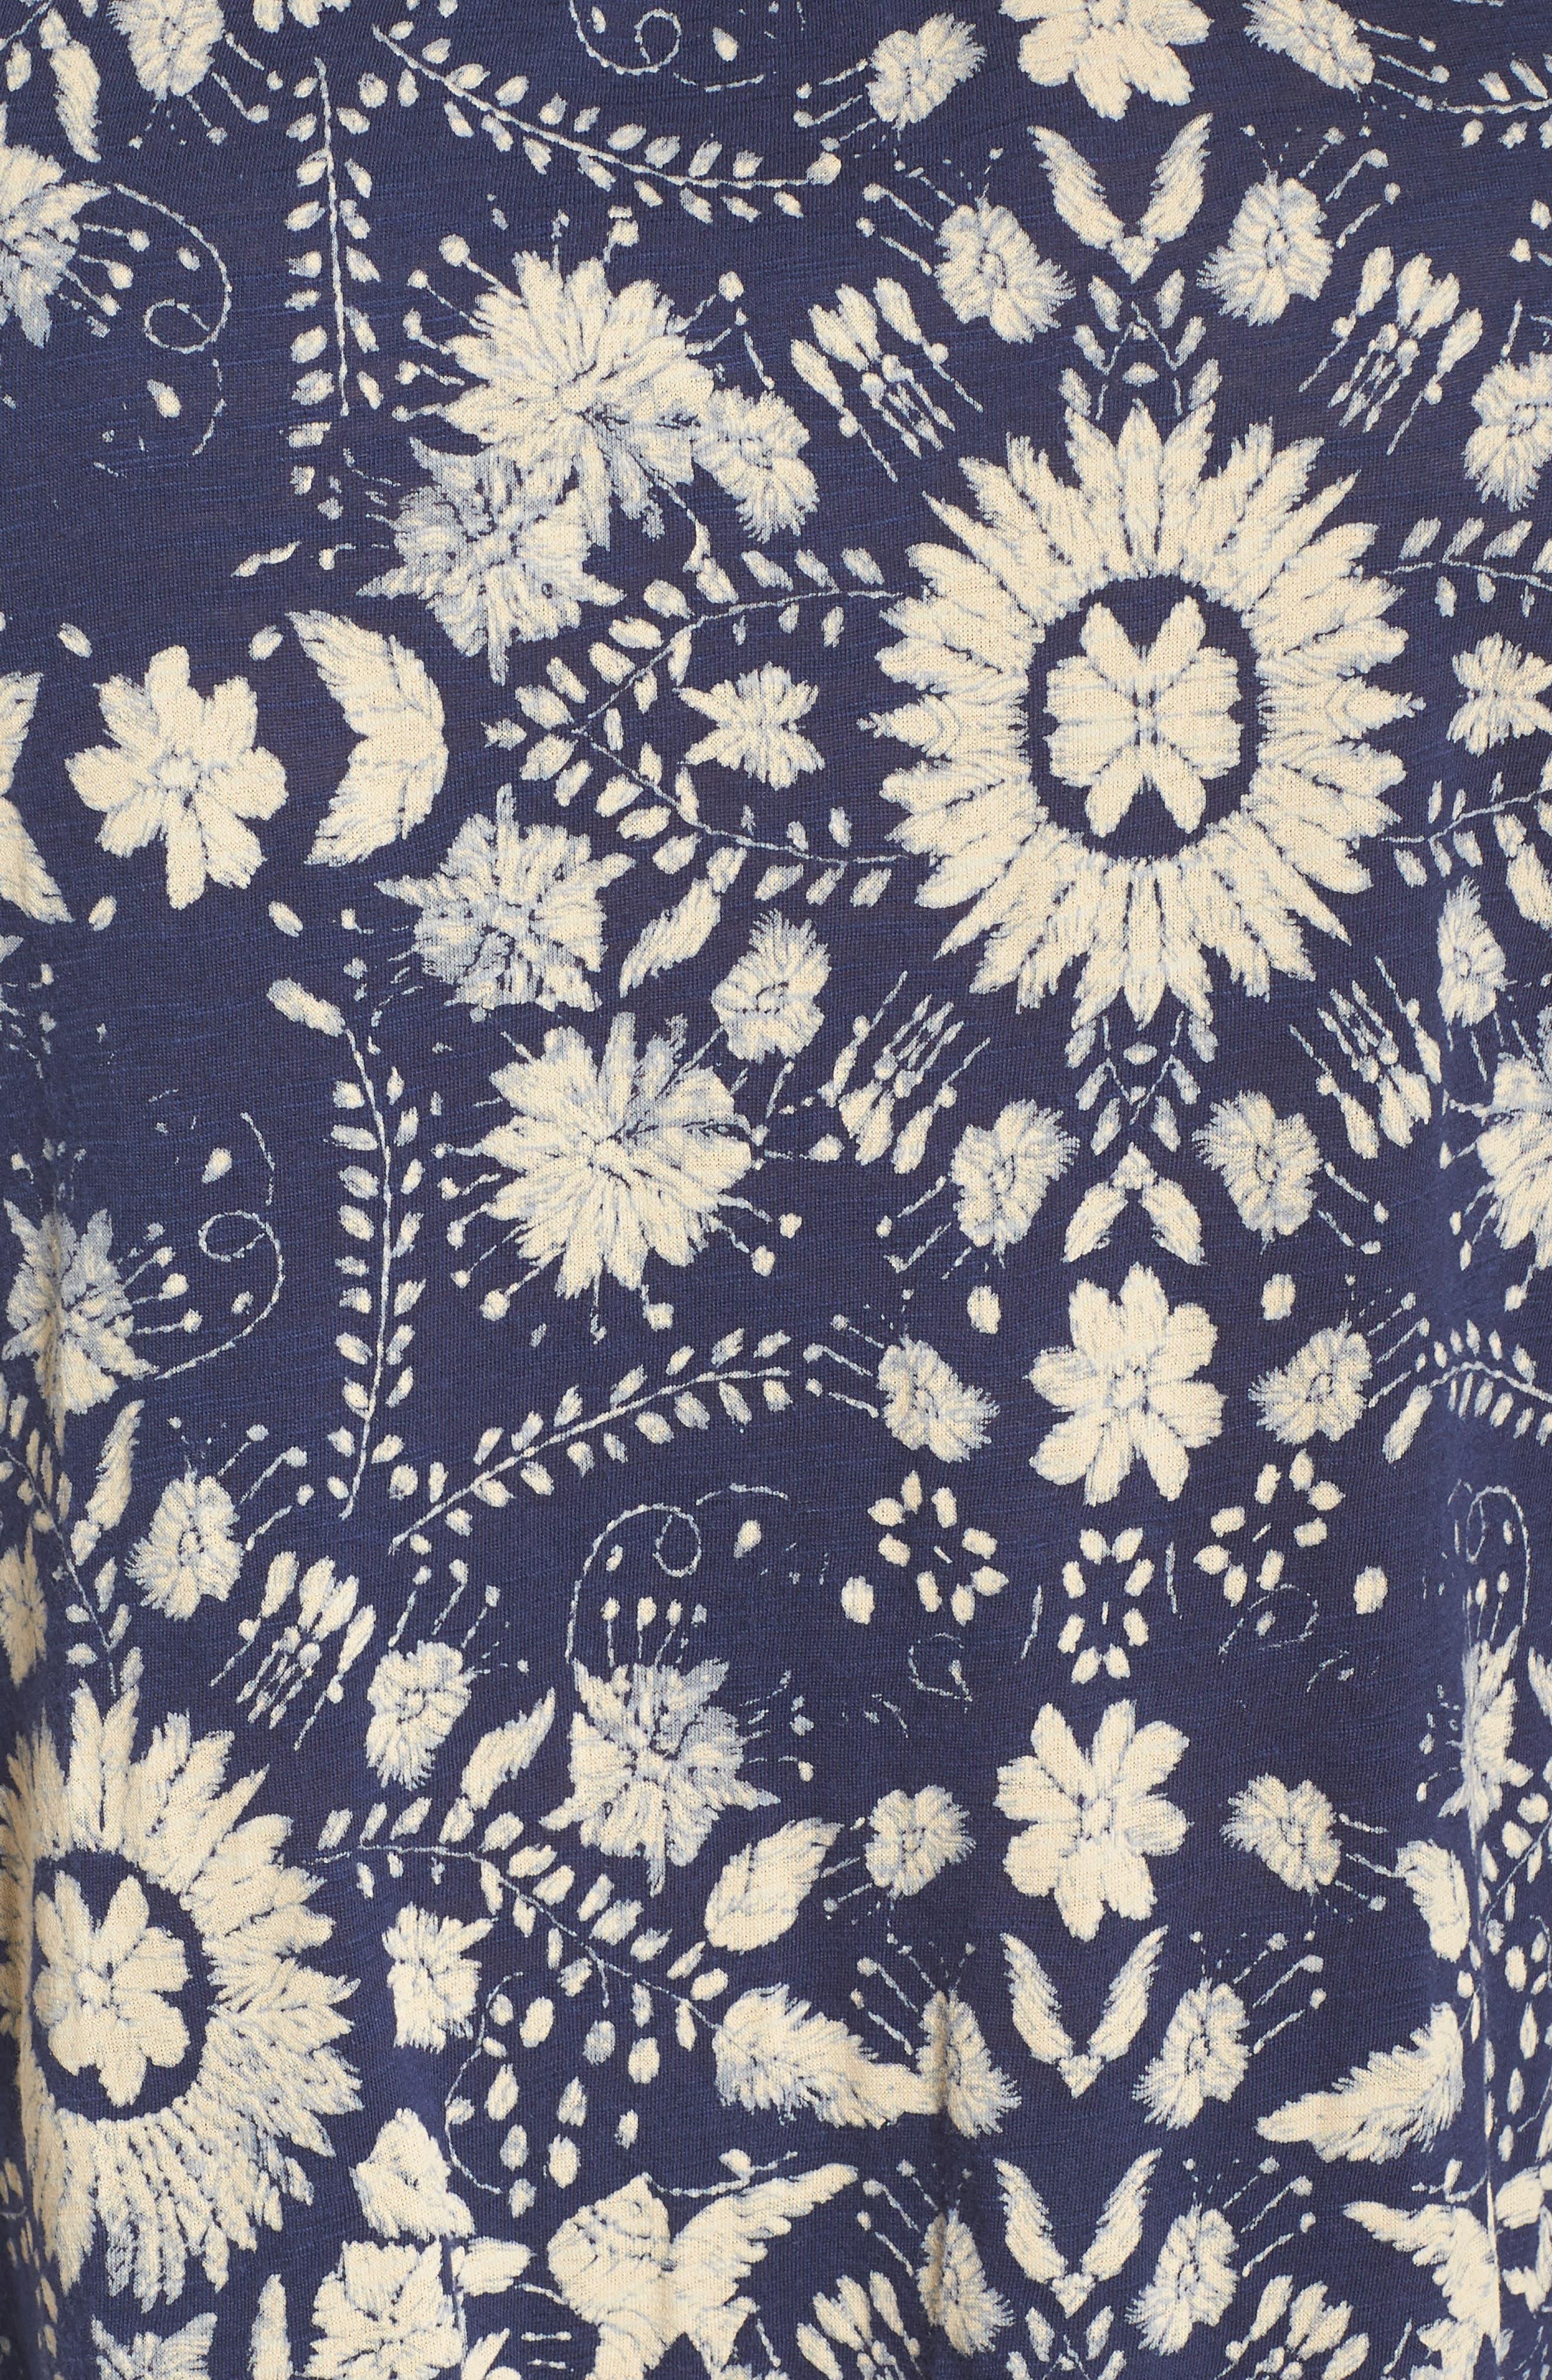 Floral Cold Shoulder Top,                             Alternate thumbnail 6, color,                             460